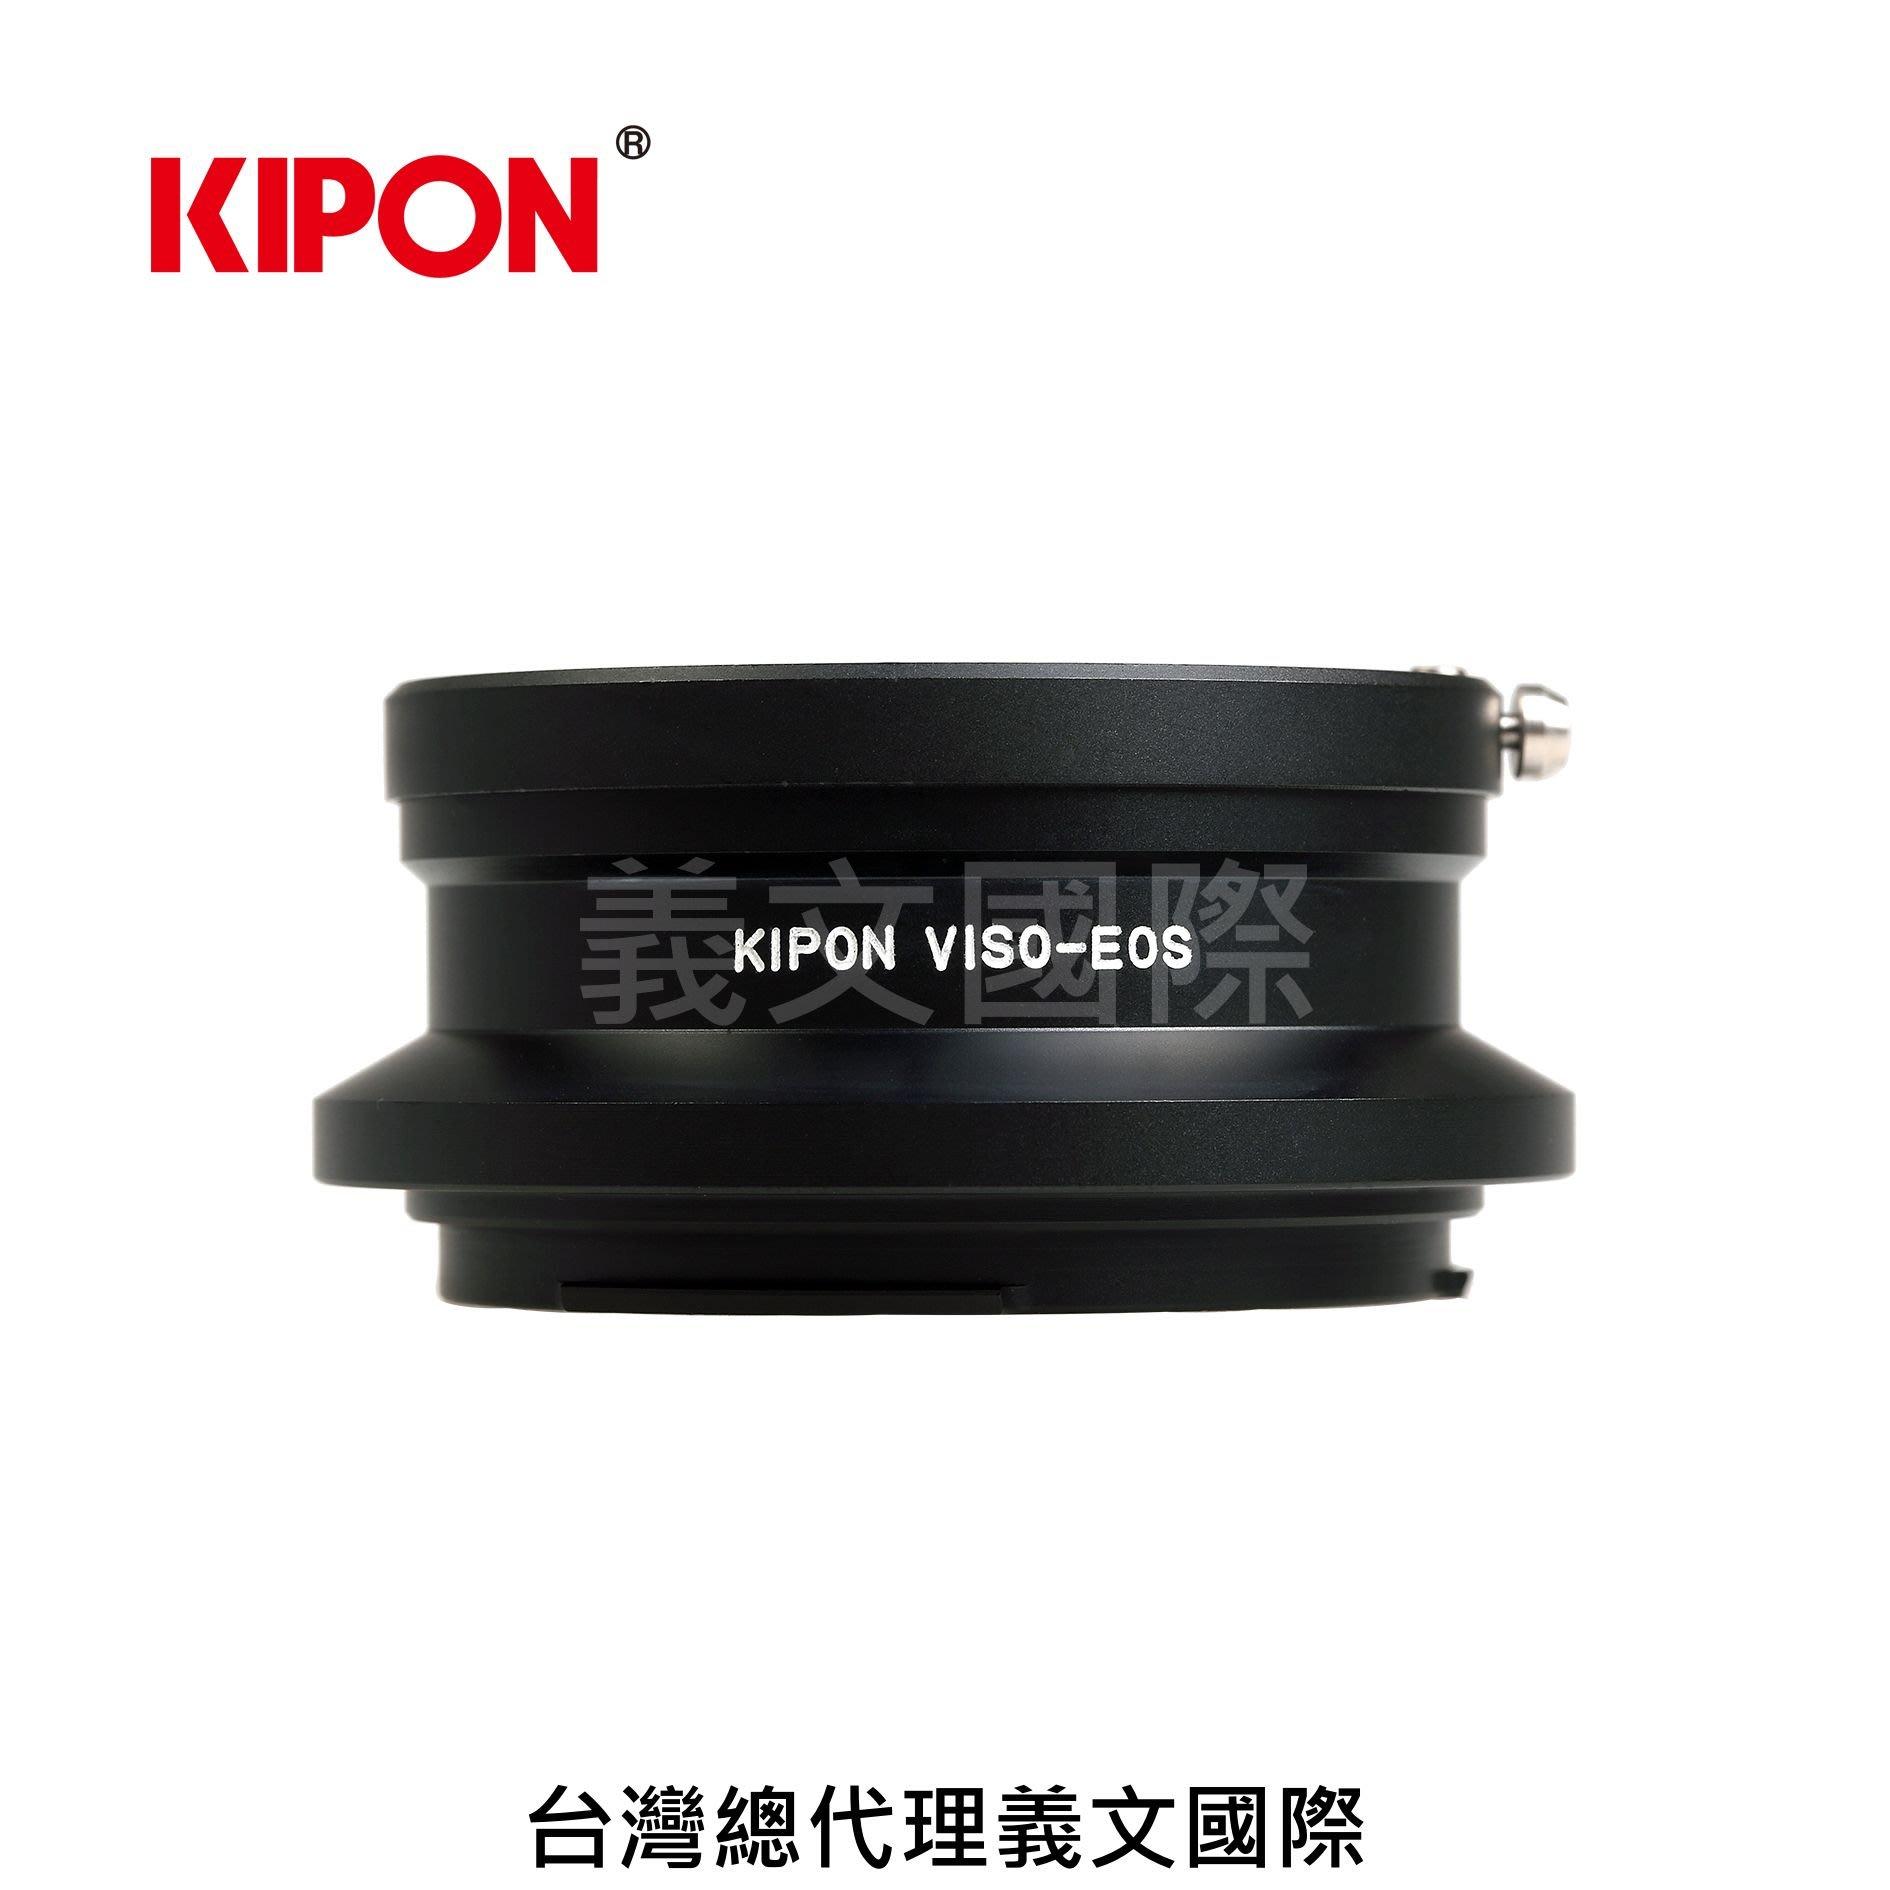 Kipon轉接環專賣店:LEICA VISO-EOS(CANON EF 佳能 5D4 6DII 90D 80D 77D 800D)